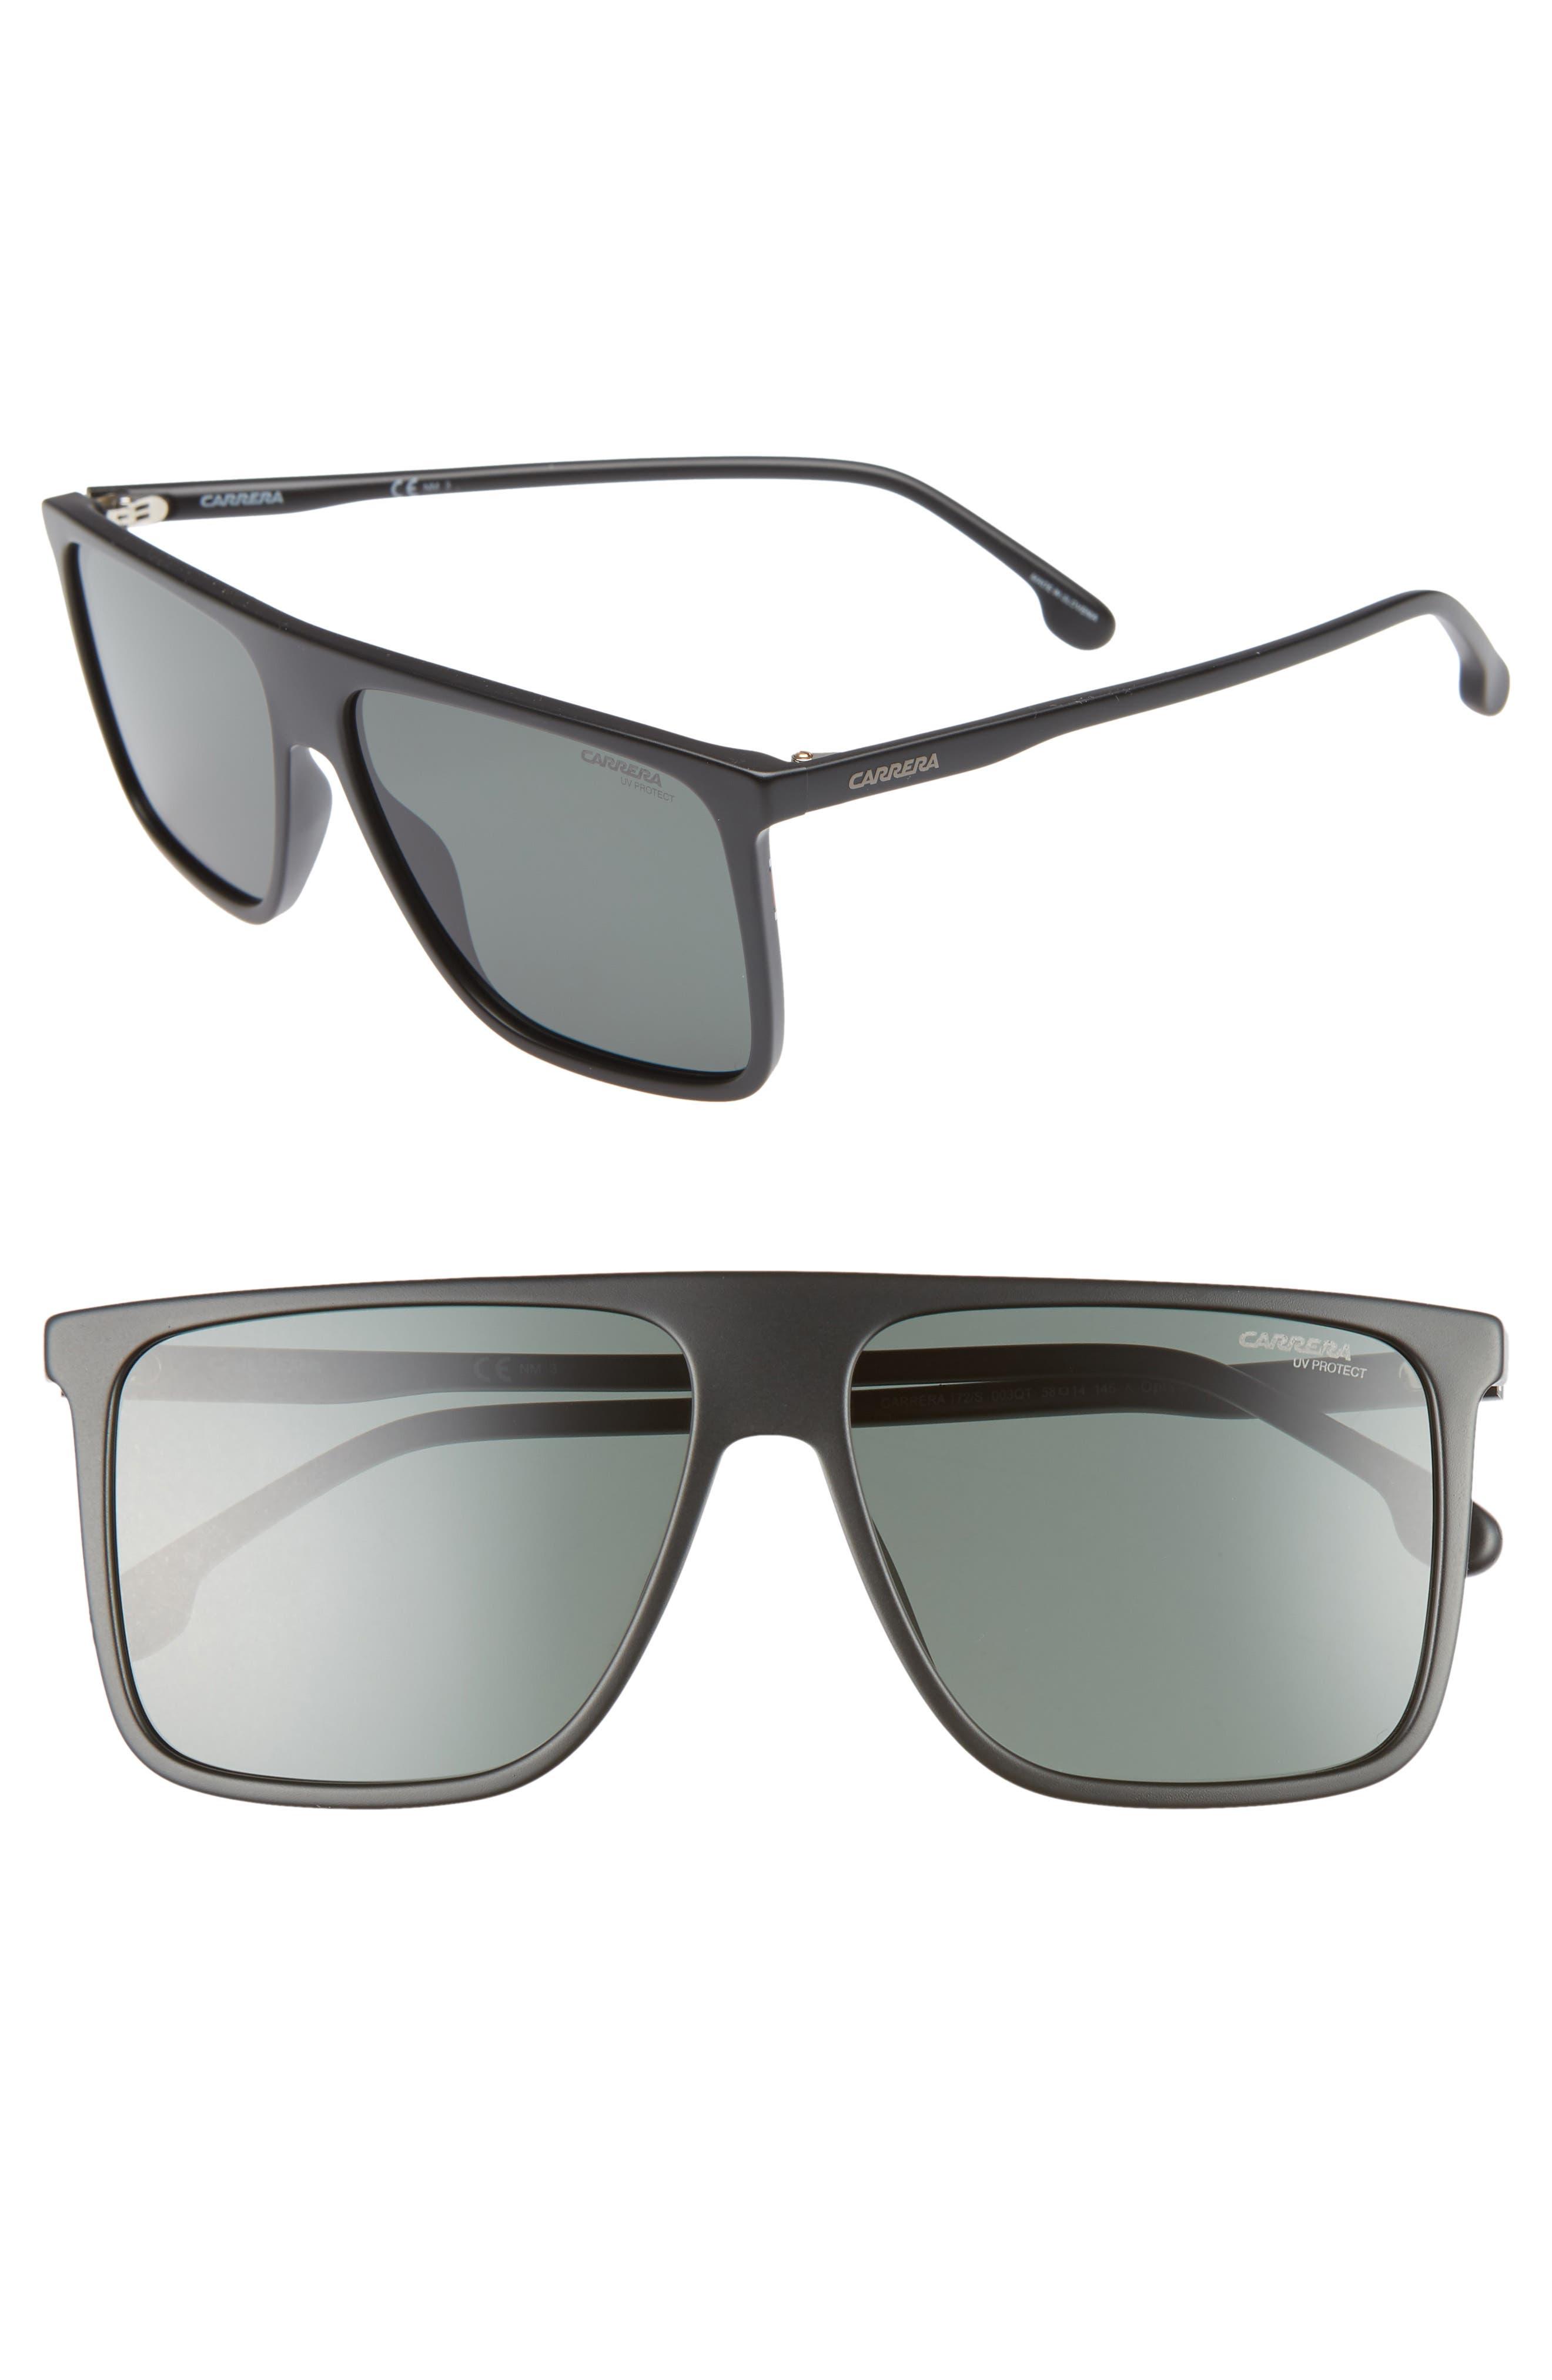 145mm Flat Top Sunglasses,                             Main thumbnail 1, color,                             MATTE BLACK